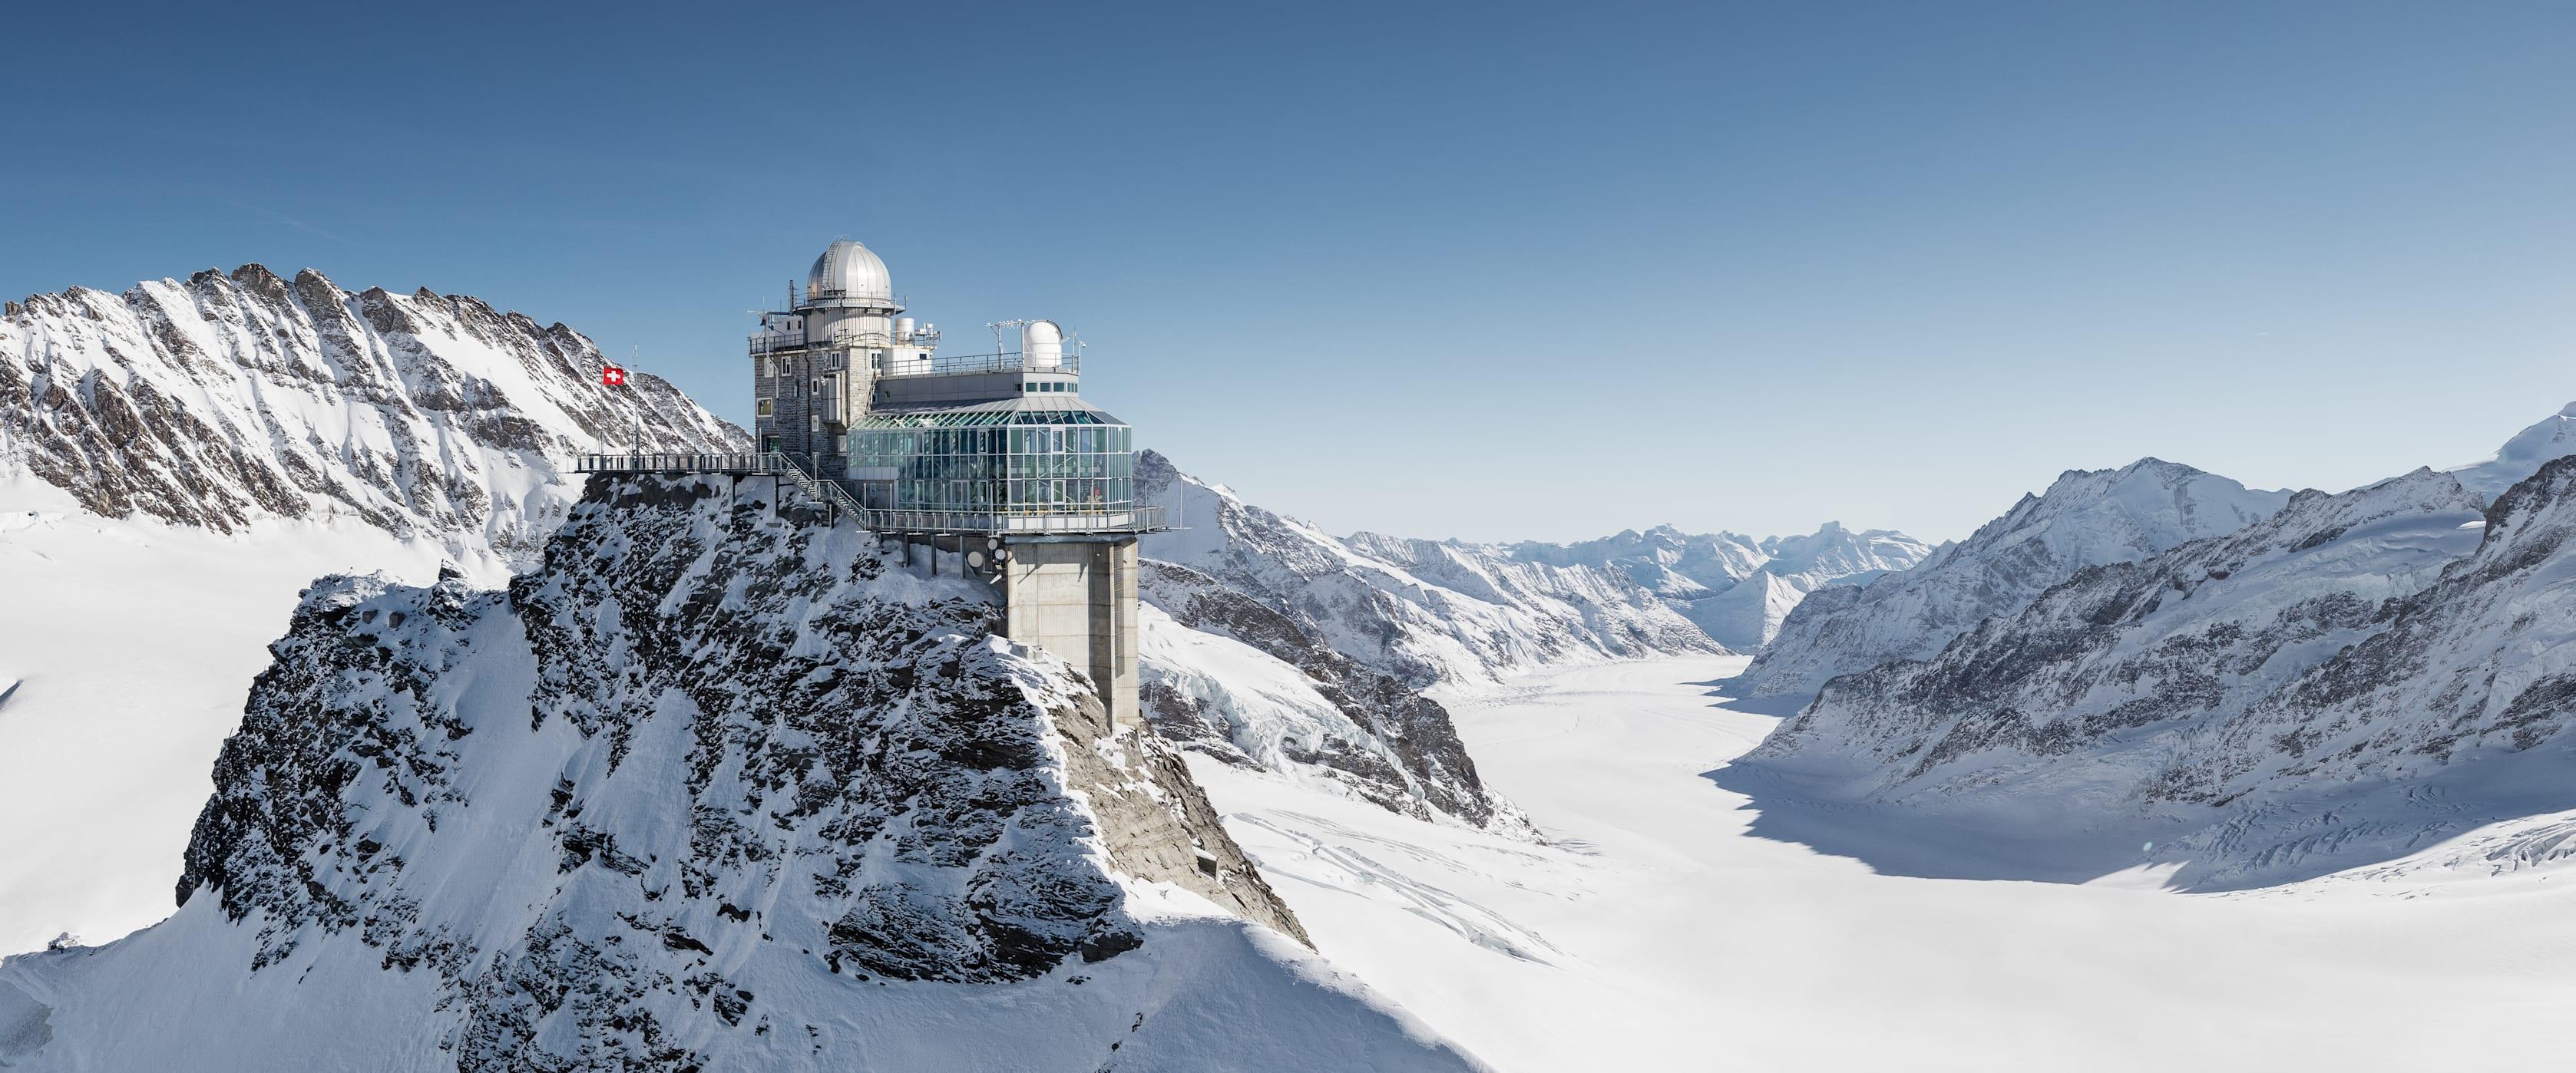 Season, Jungfraujoch-Top-of-Europe, Winter, jungfrau.ch/en-gb/